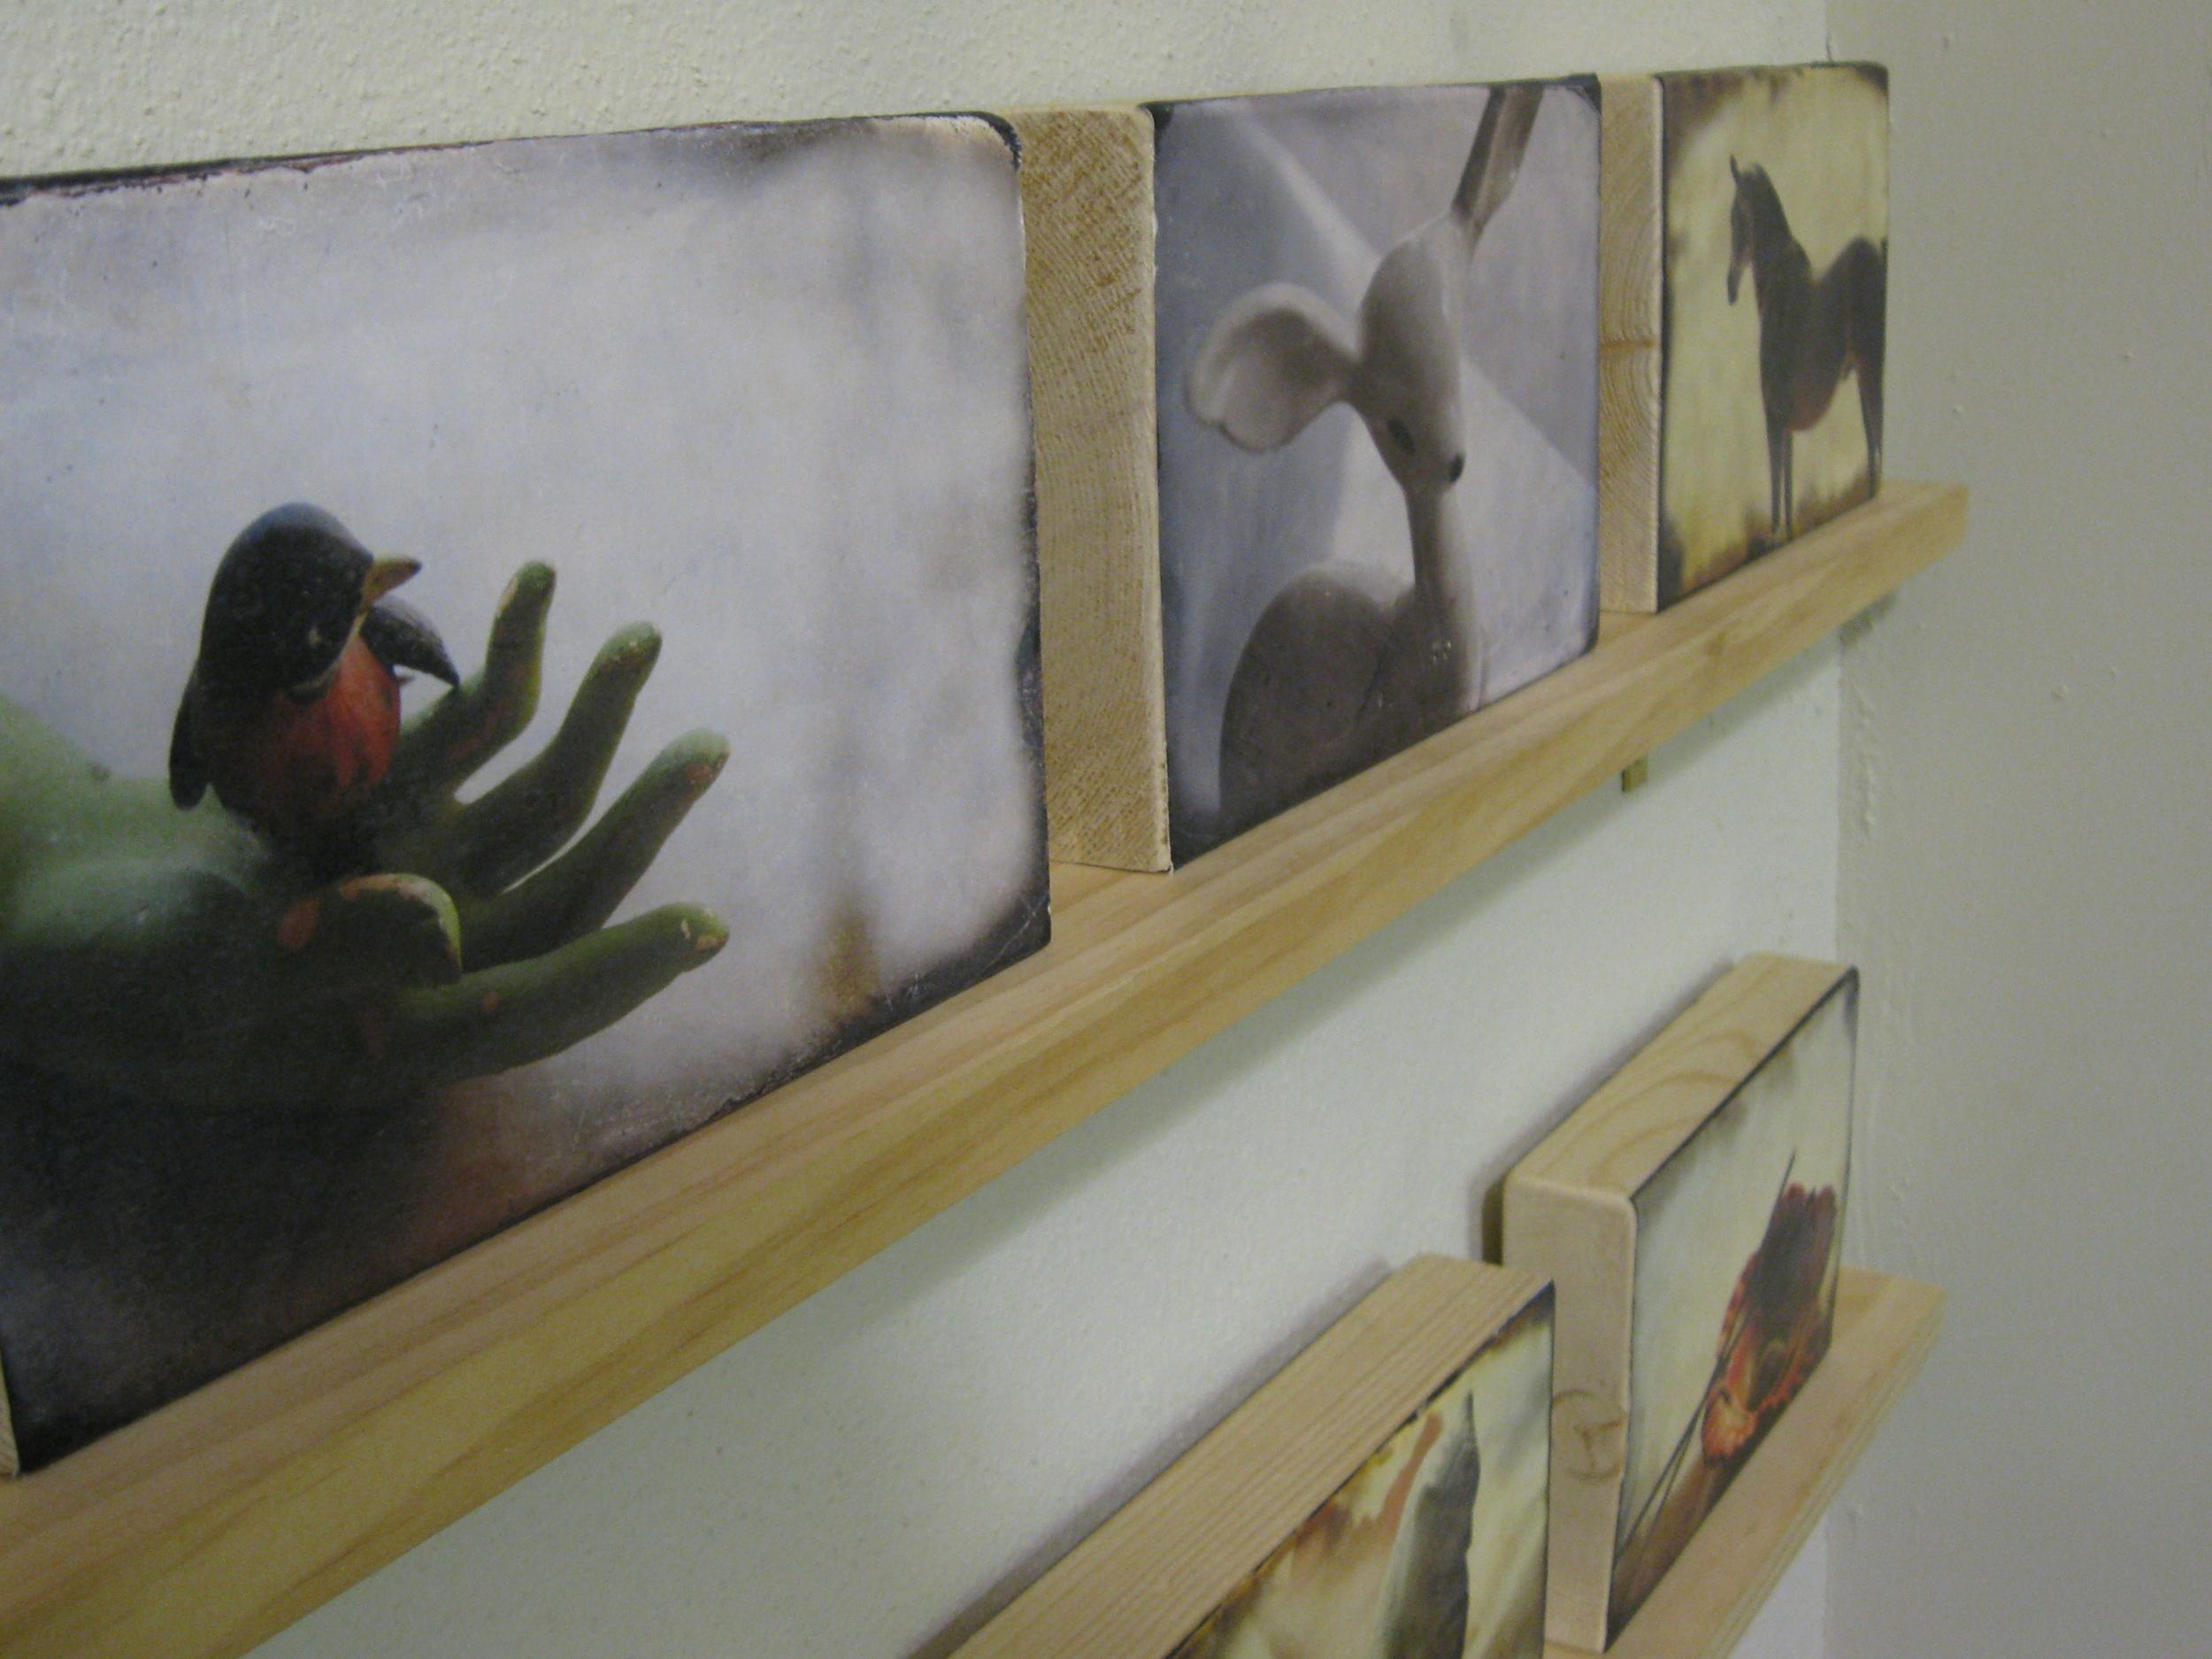 Series of photo transfers on wood block by Raydel Shanks